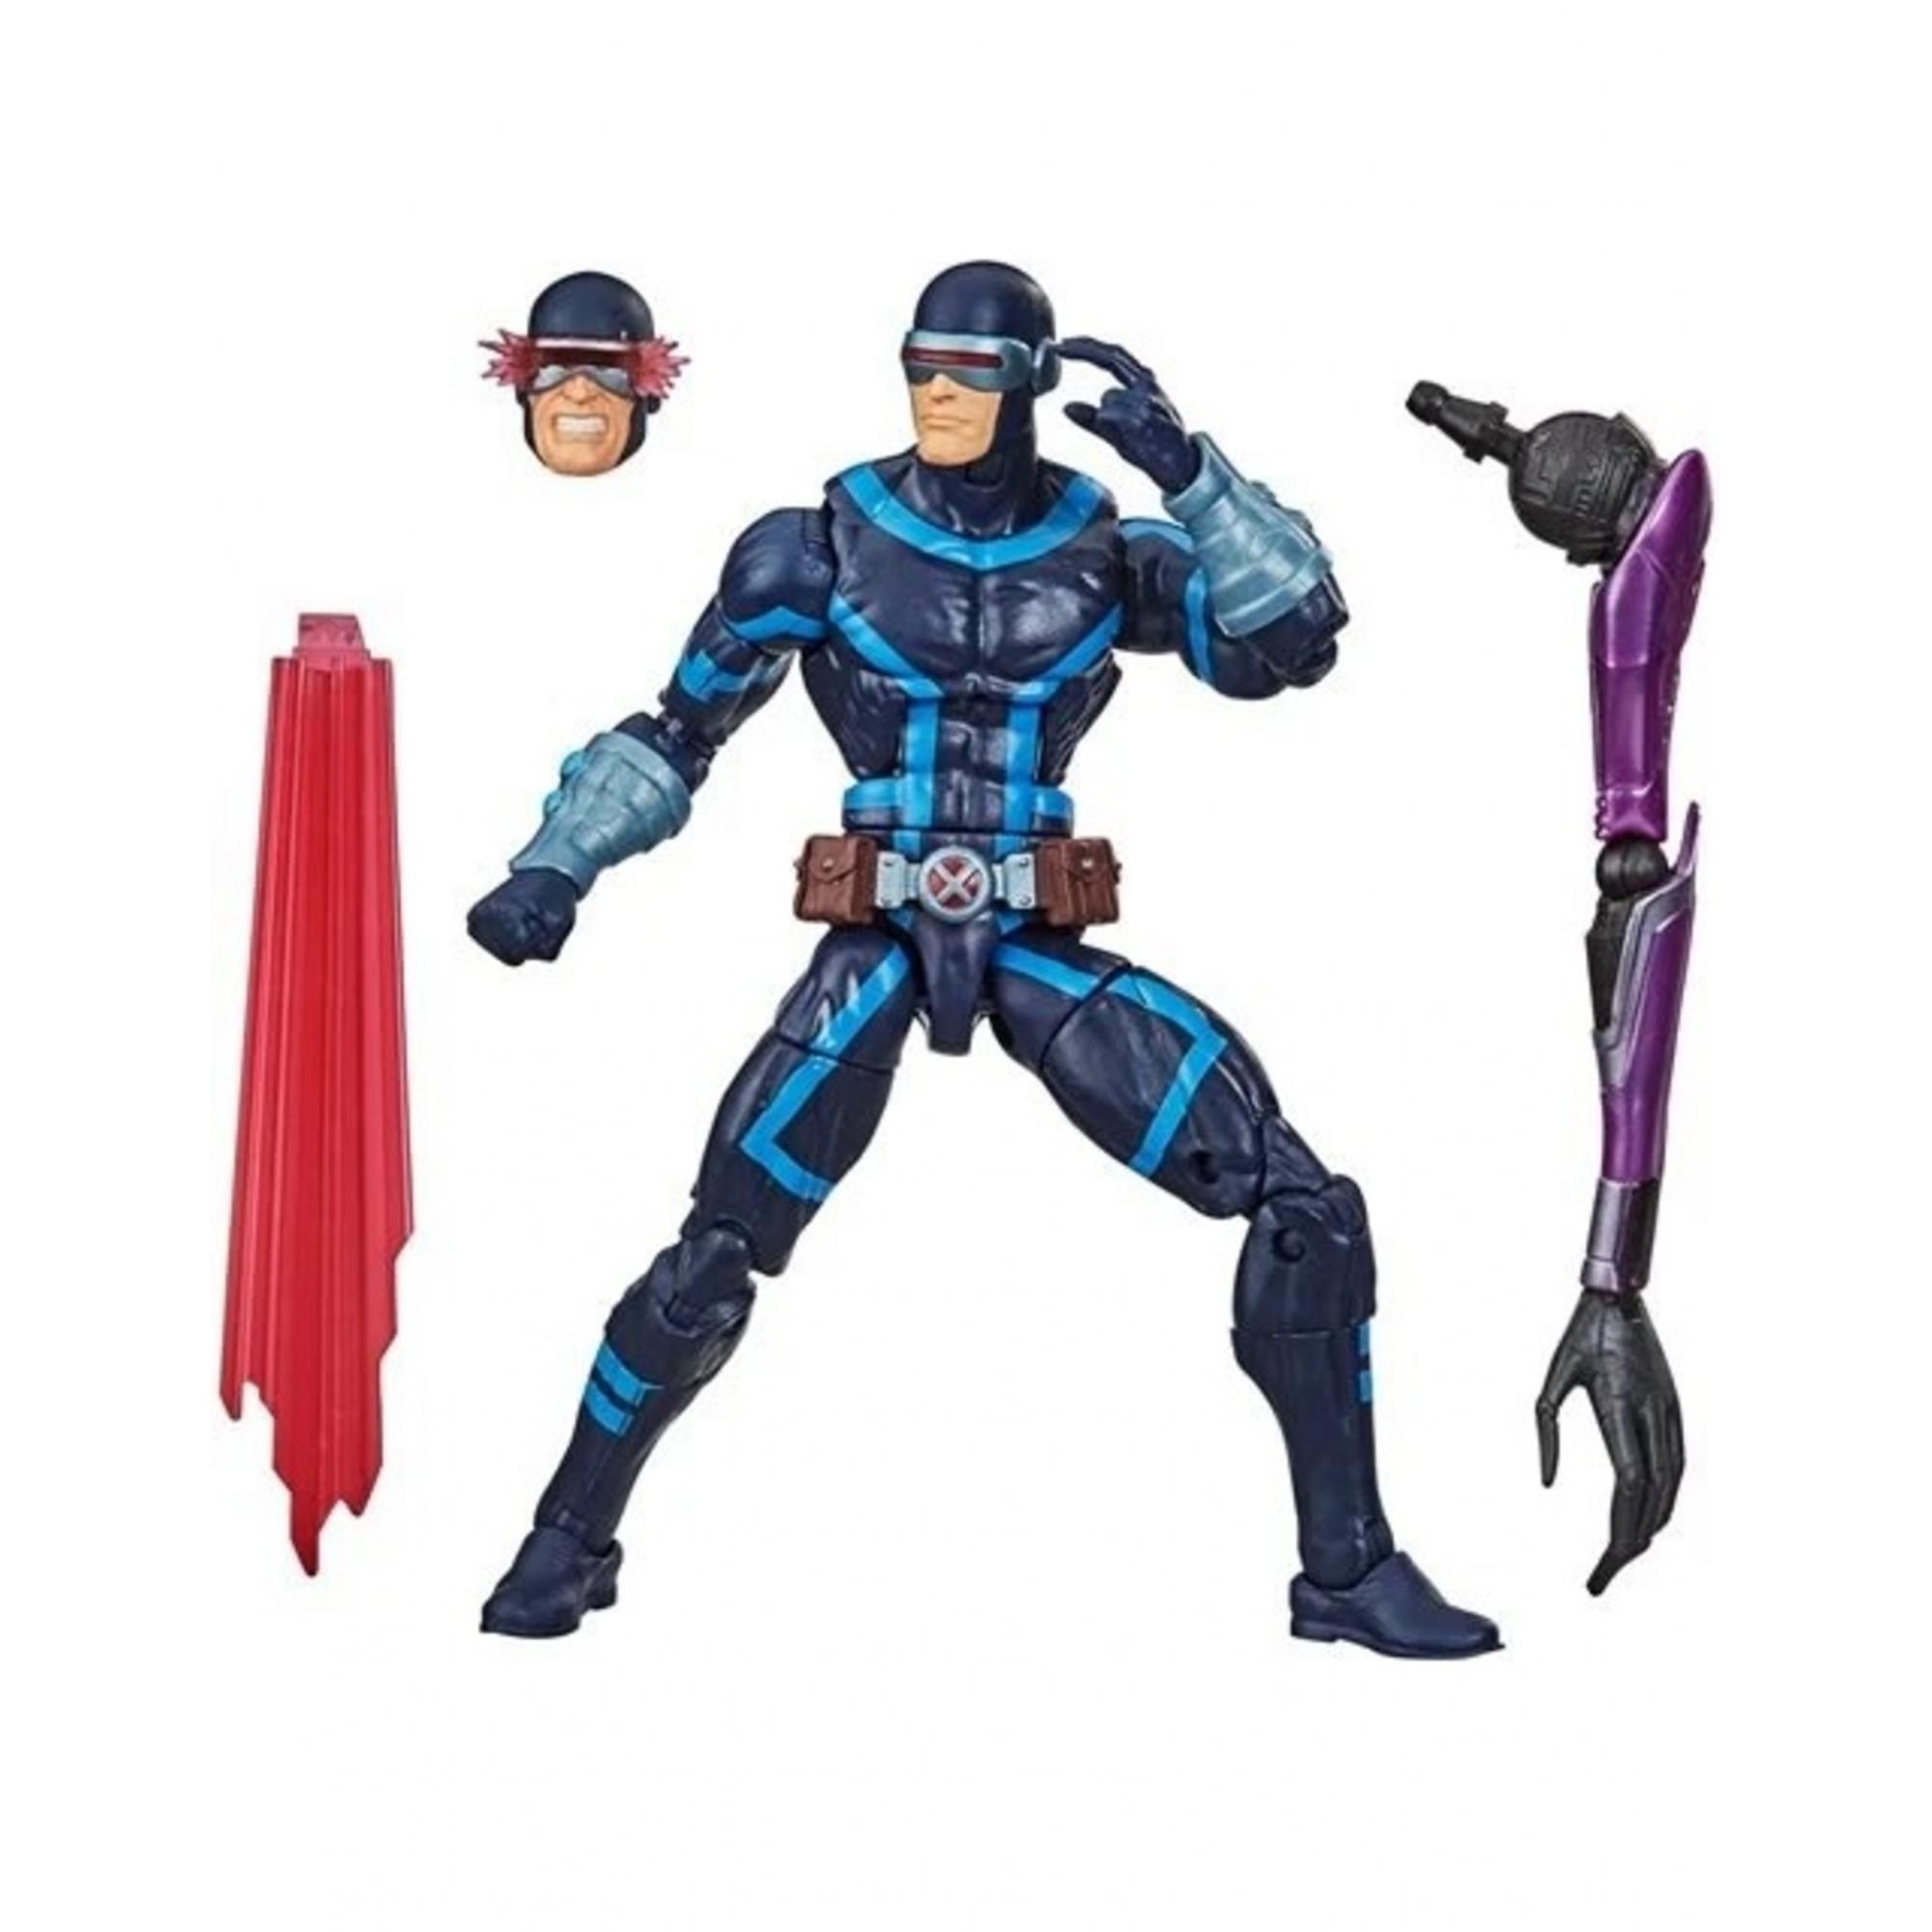 Action Figure House Of X/Cyclops: X - Men Marvel Legends Series - Hasbro (F0336)